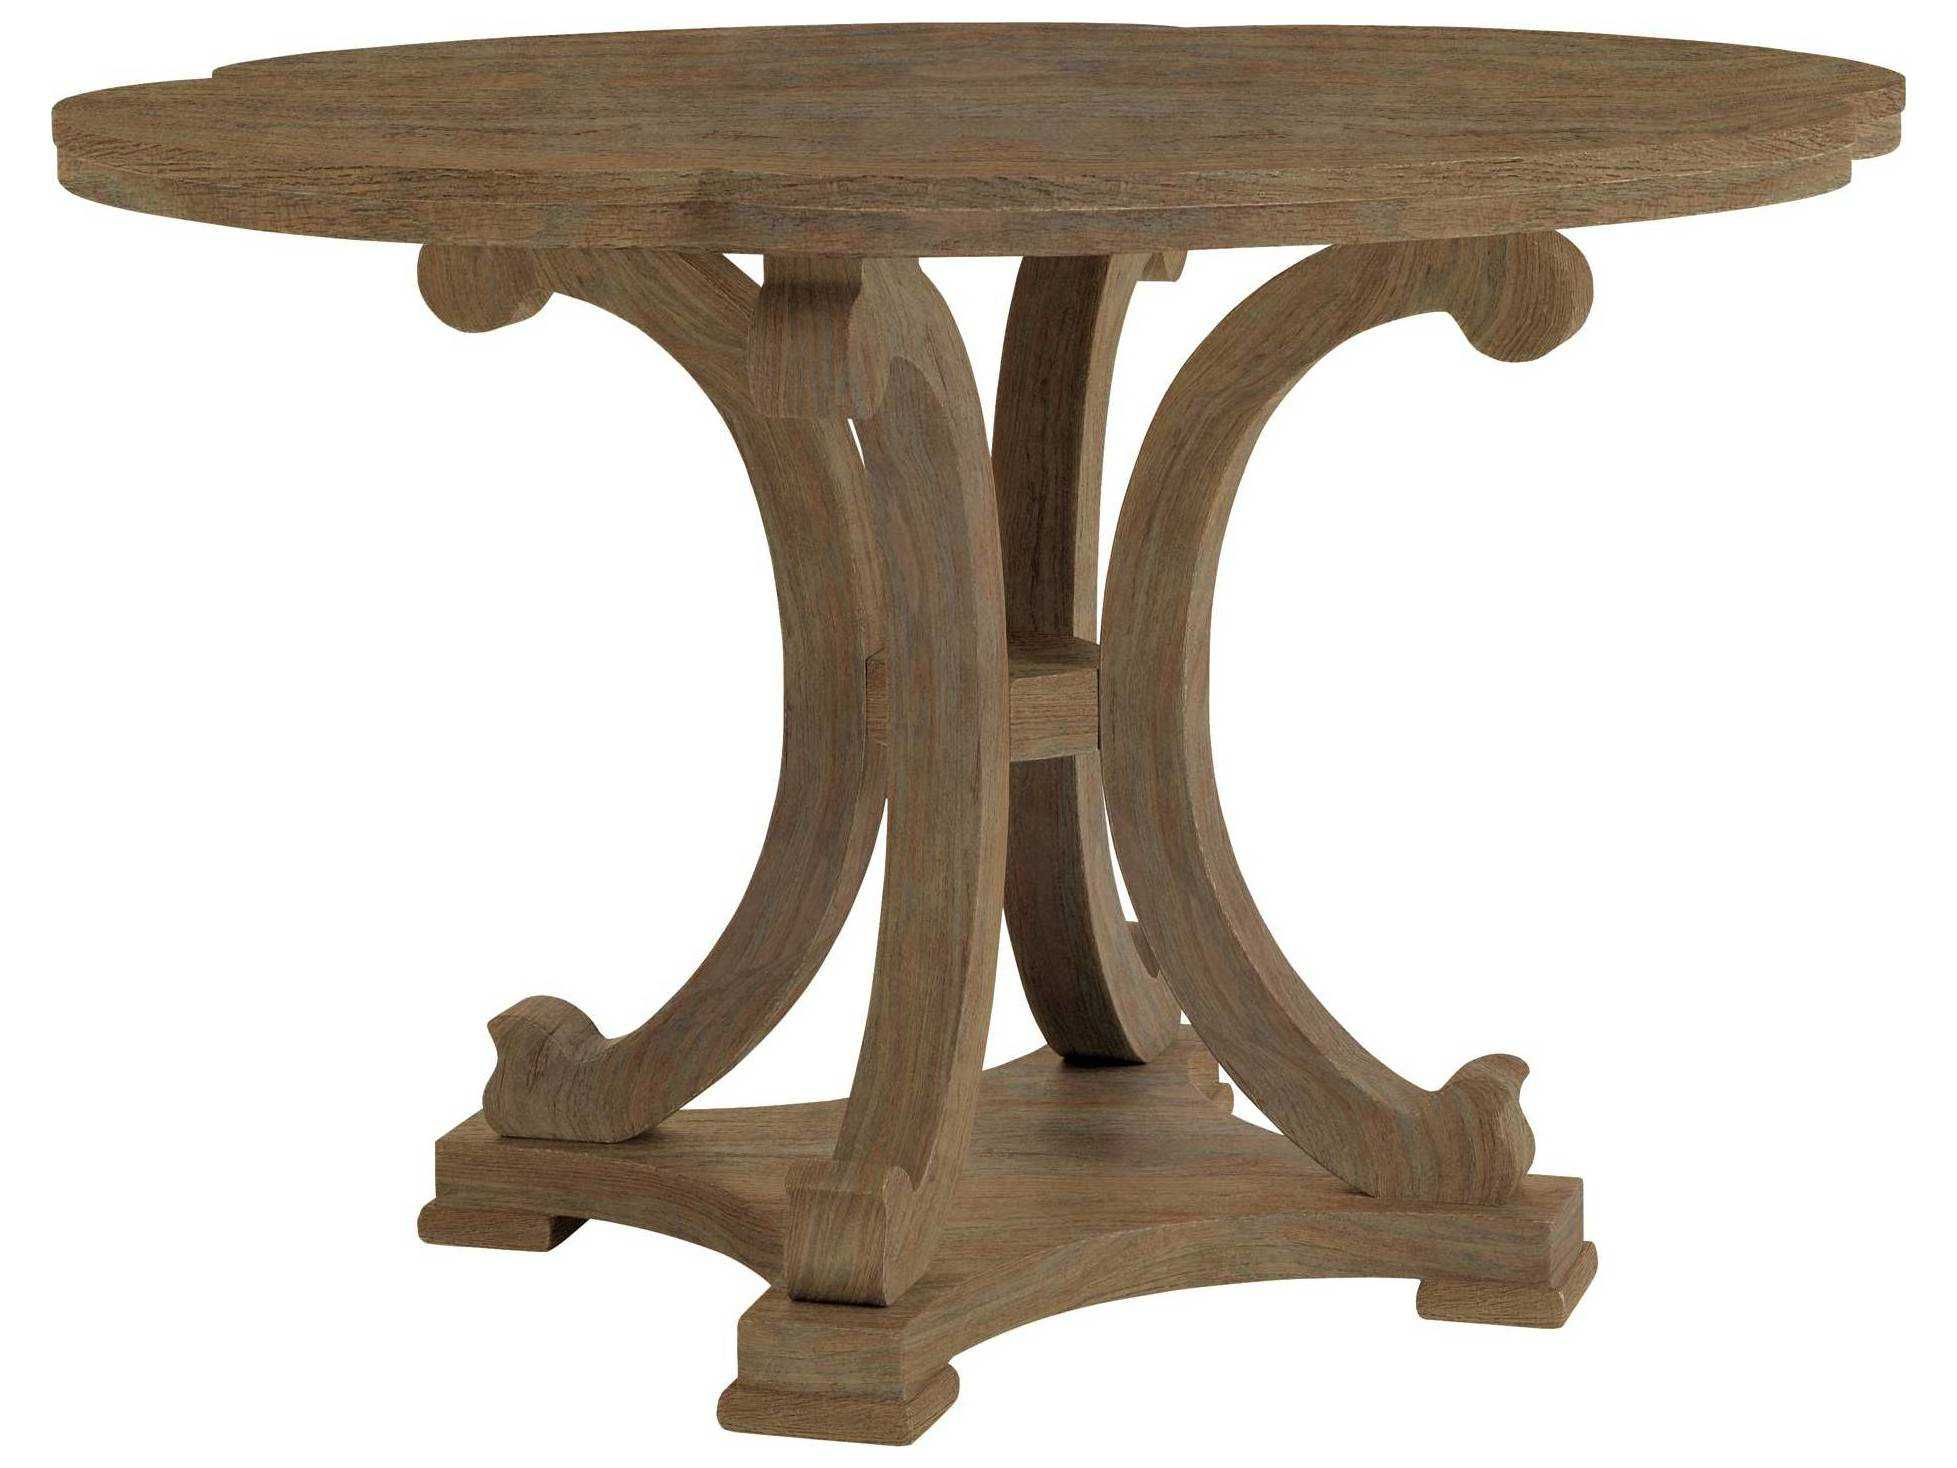 Coastal Living Dining Table: Stanley Furniture Coastal Living Resort Deck 46.25'' Round